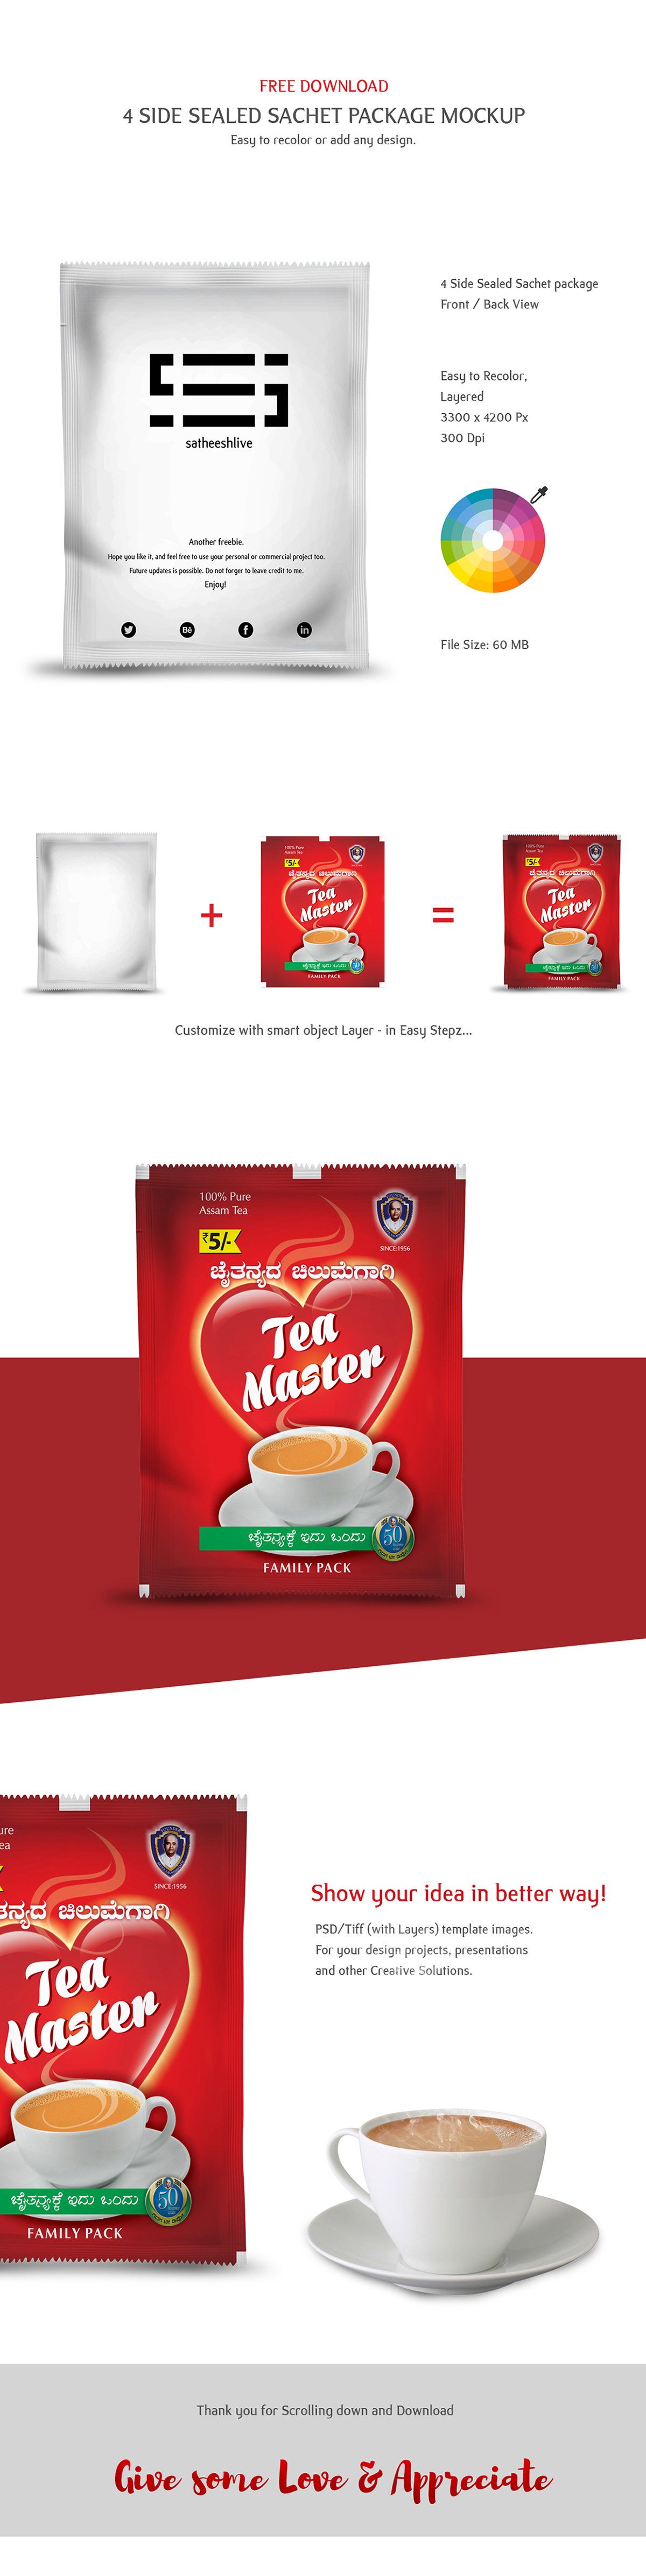 Download Free Individual Wrapped Sachet Psd Mockup Free Tea Coffee Sachet